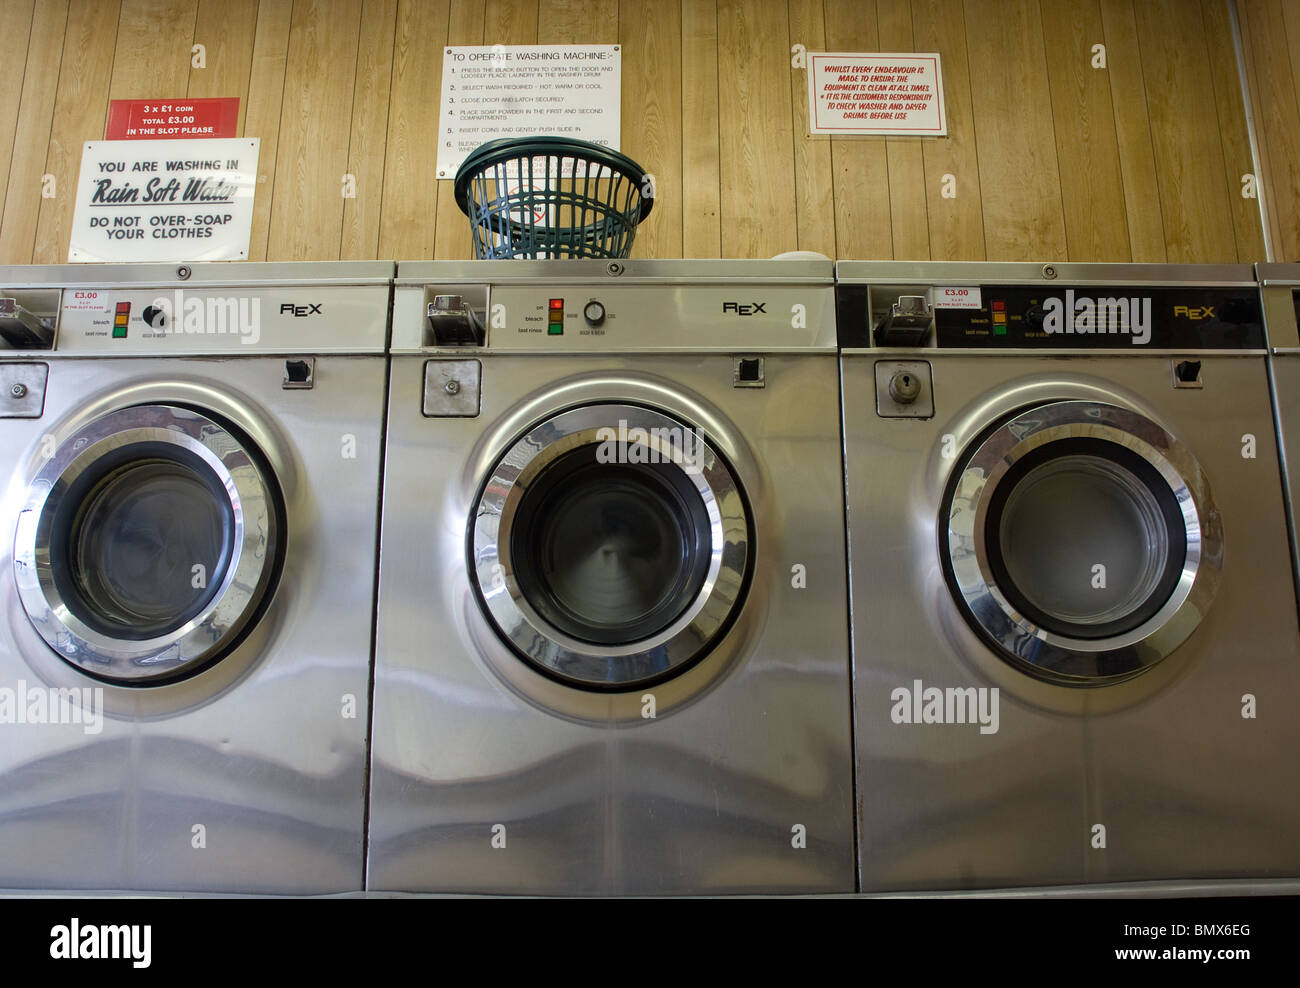 three washing machines inside a public laundrette - Stock Image